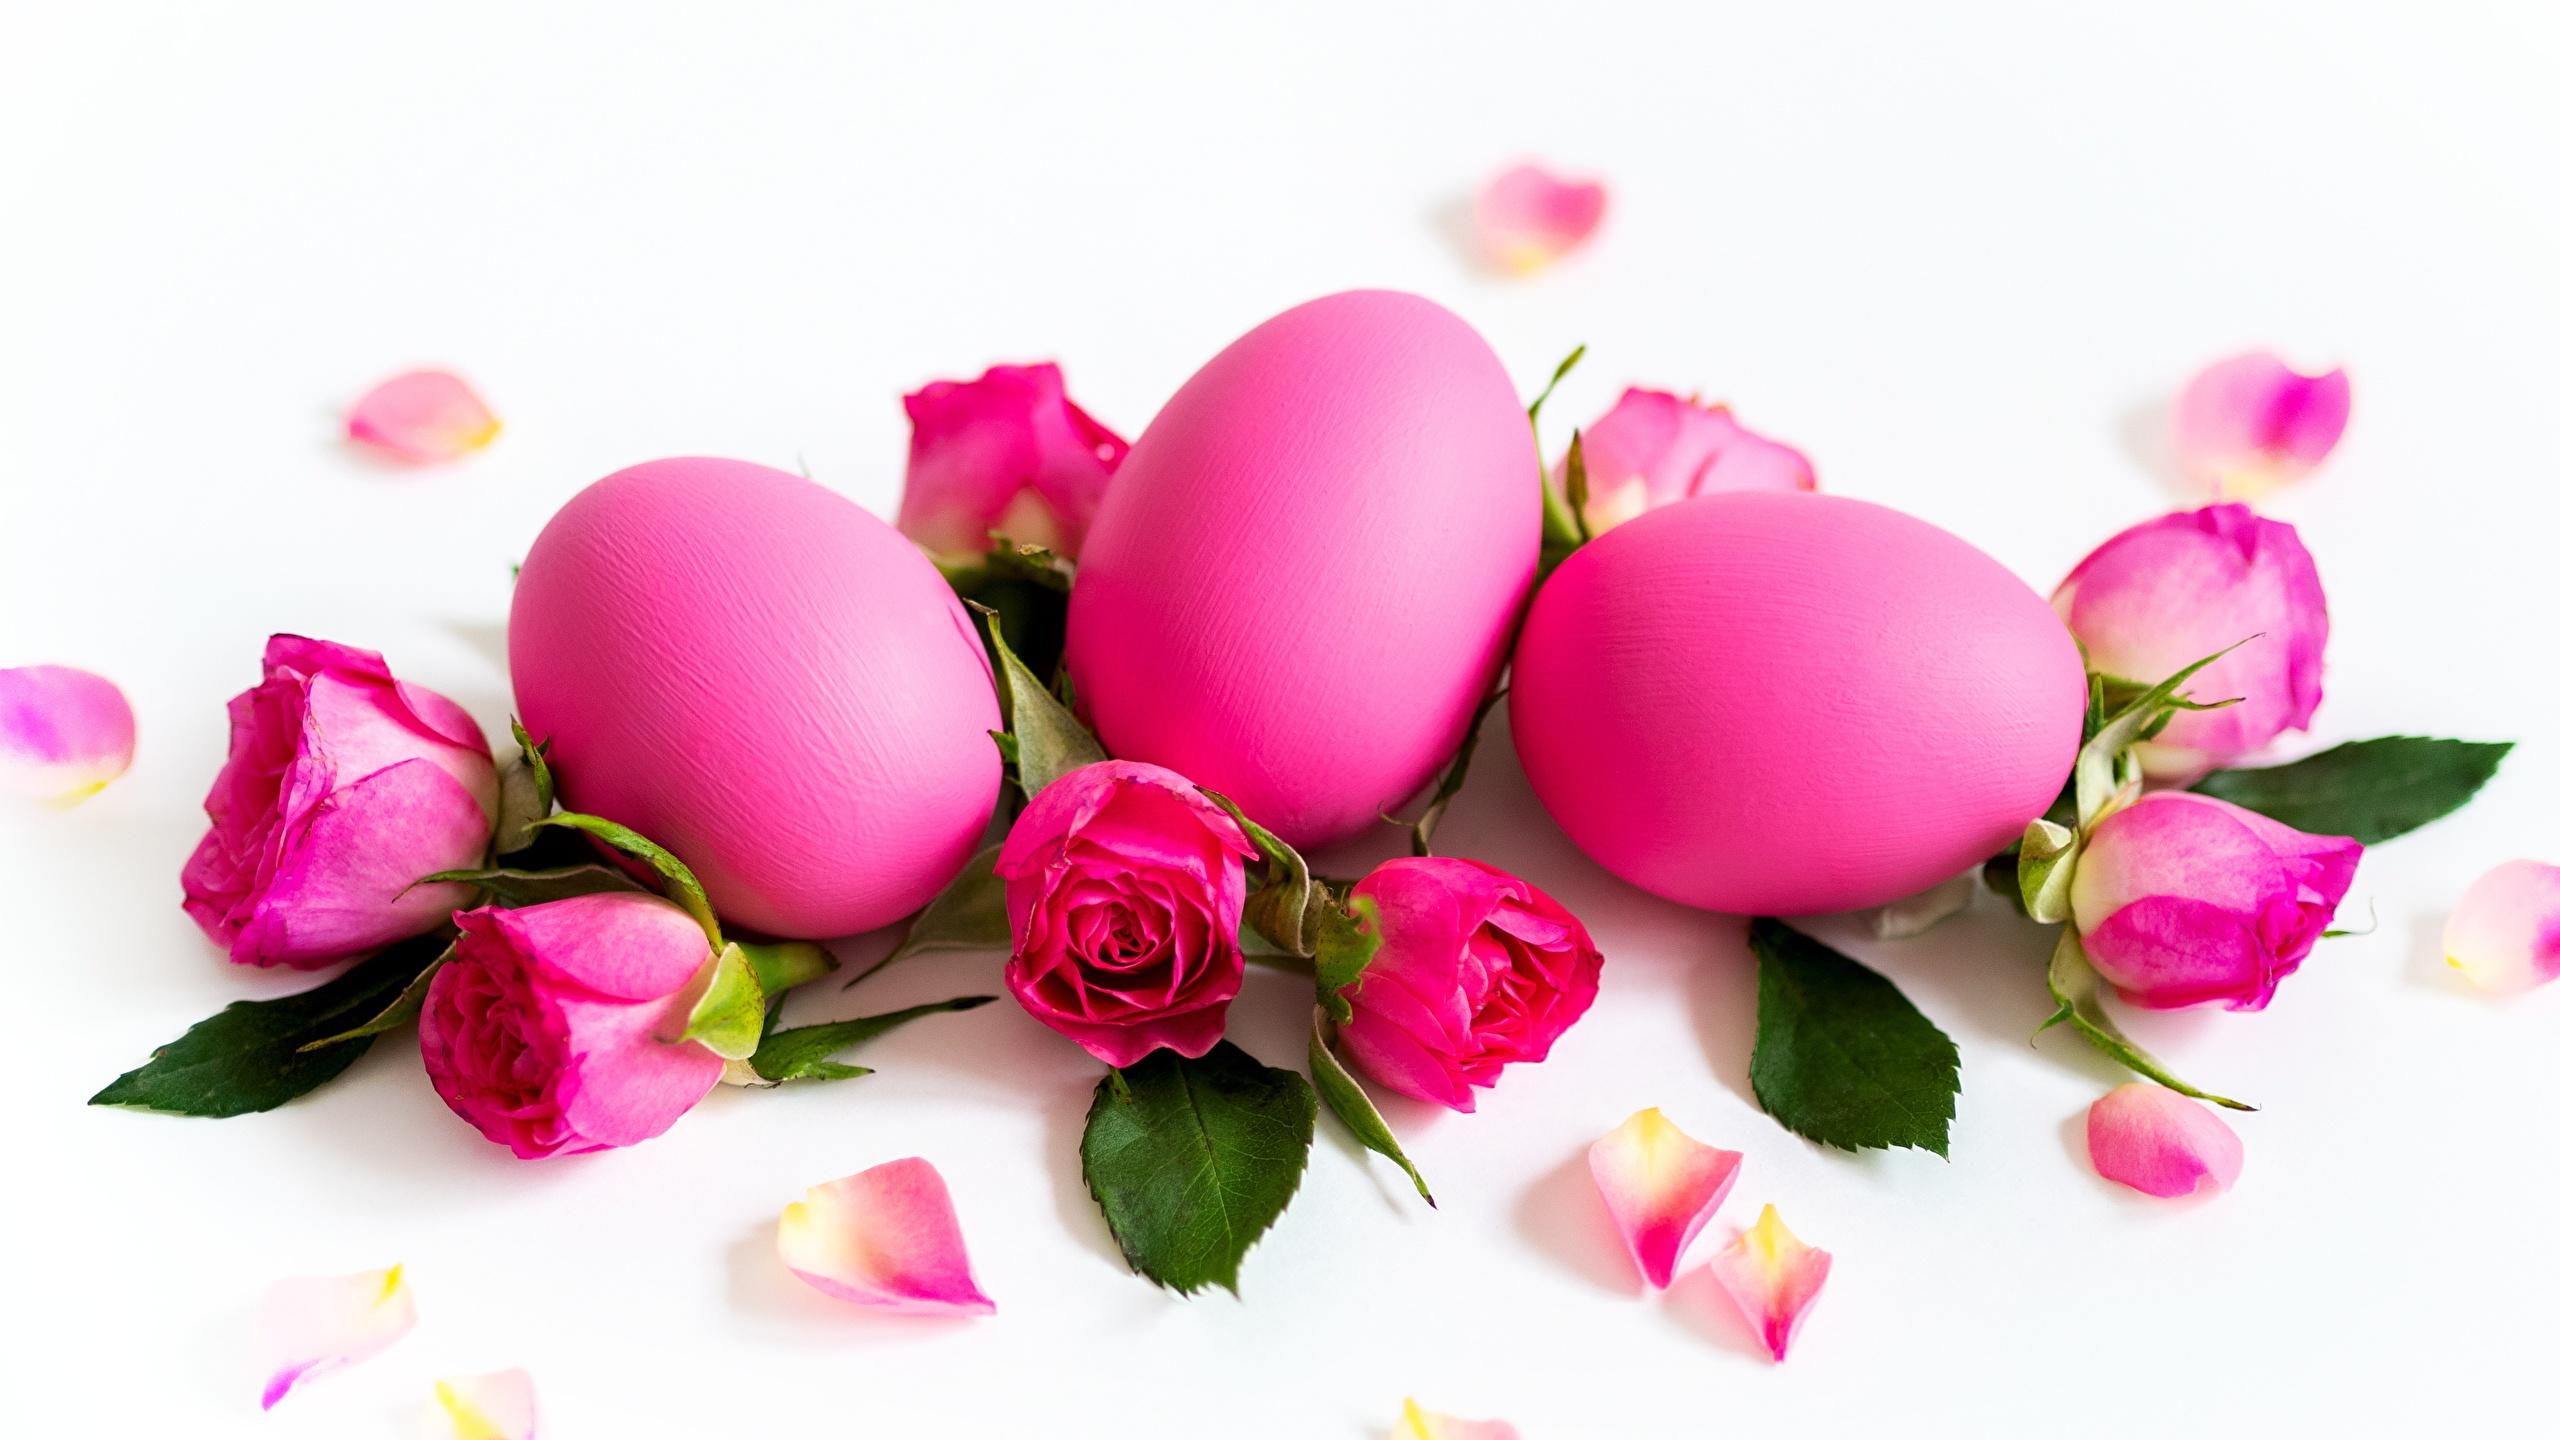 Fonds Decran 2560x1440 Pâques Roses Fond Blanc Rose Couleur